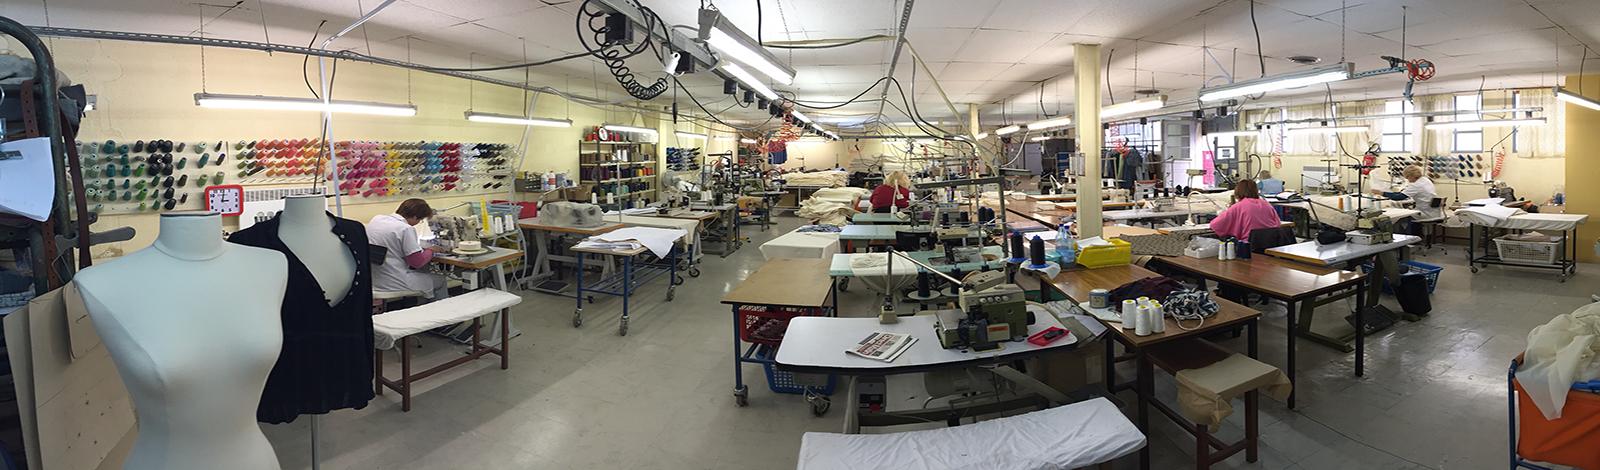 Panorama Ateliers Facon et Confection